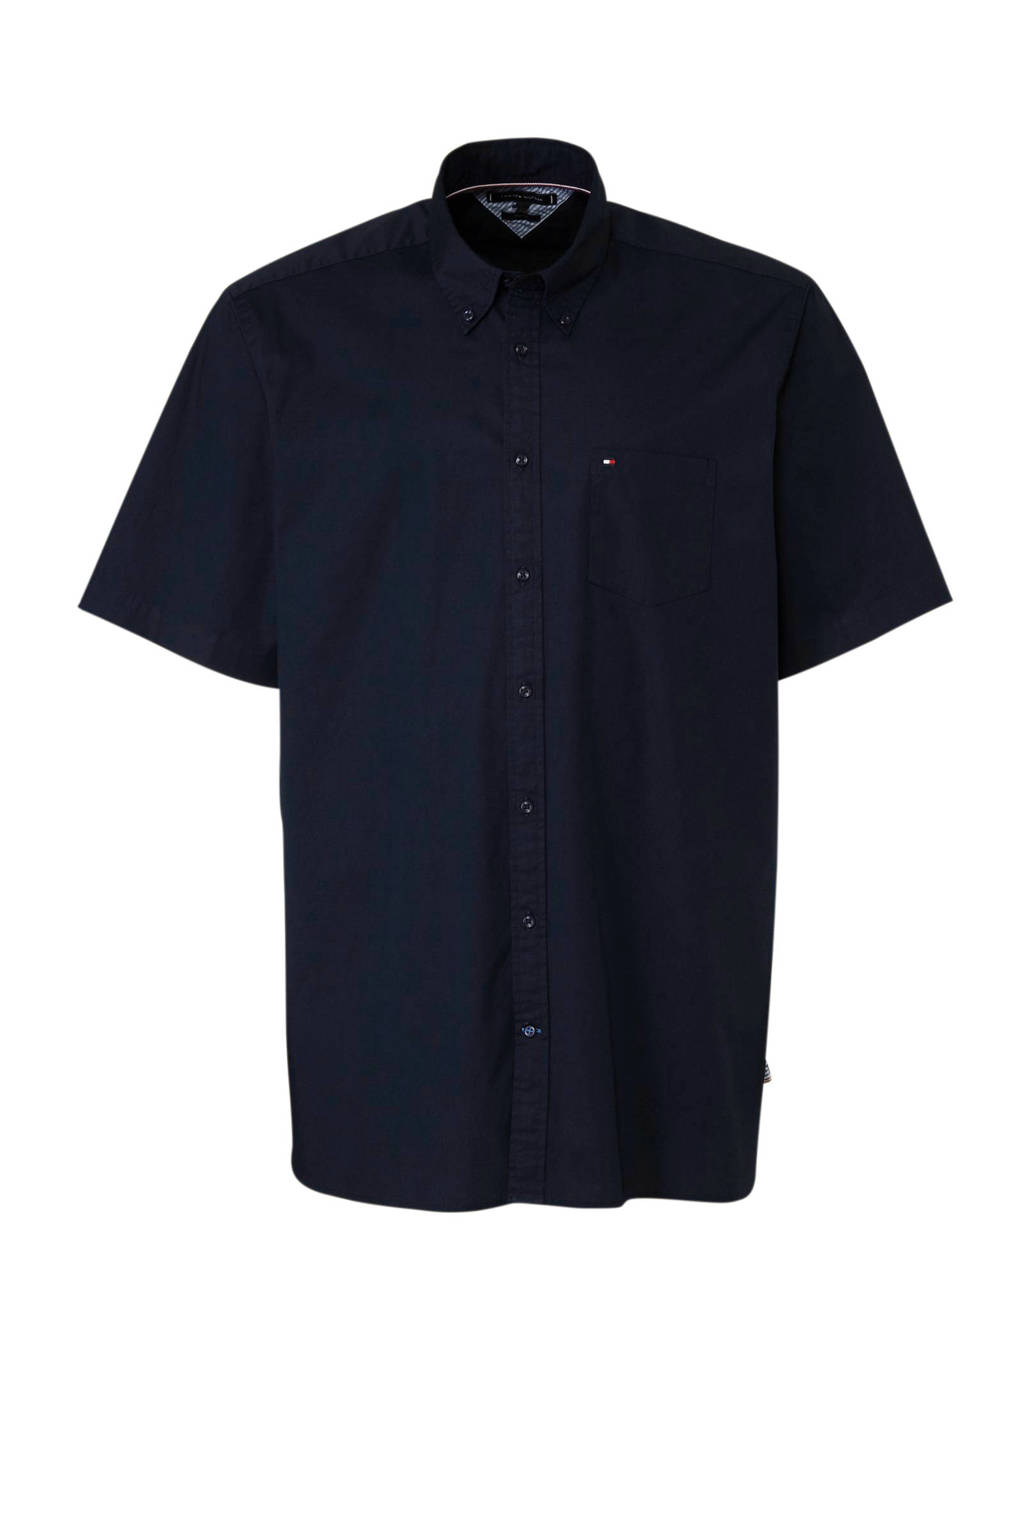 Tommy Hilfiger Big & Tall +size regular fit overhemd, Donkerblauw